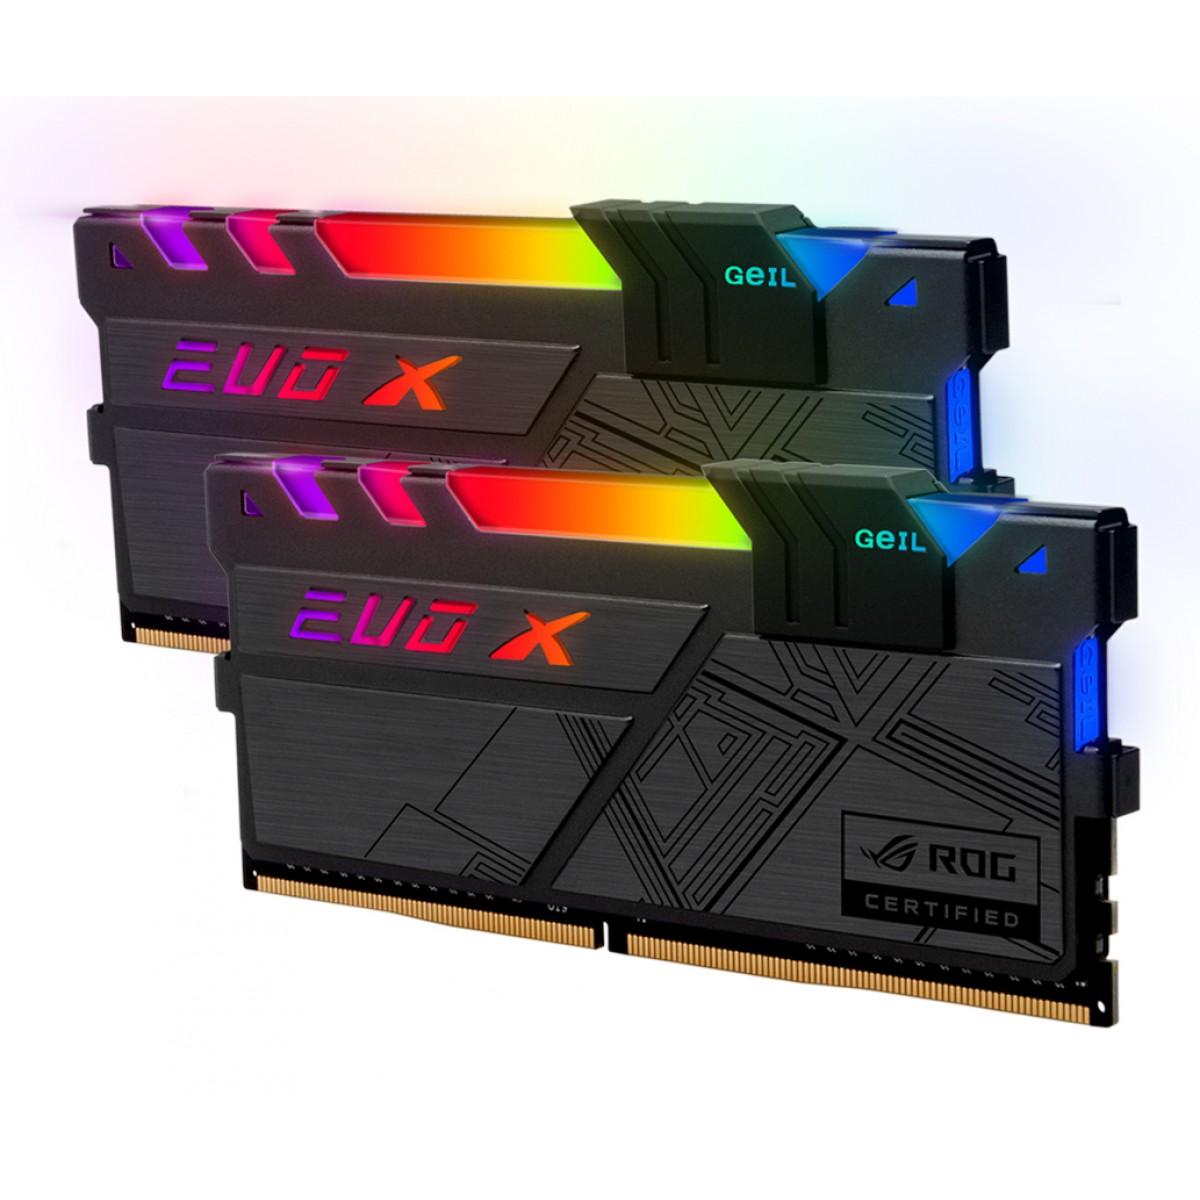 Memória DDR4 Geil EVO X II RGB, 16GB (2x8GB) 3600MHz, ROG CERTIFIED, Black, GREXSR416GB3600C18BDC